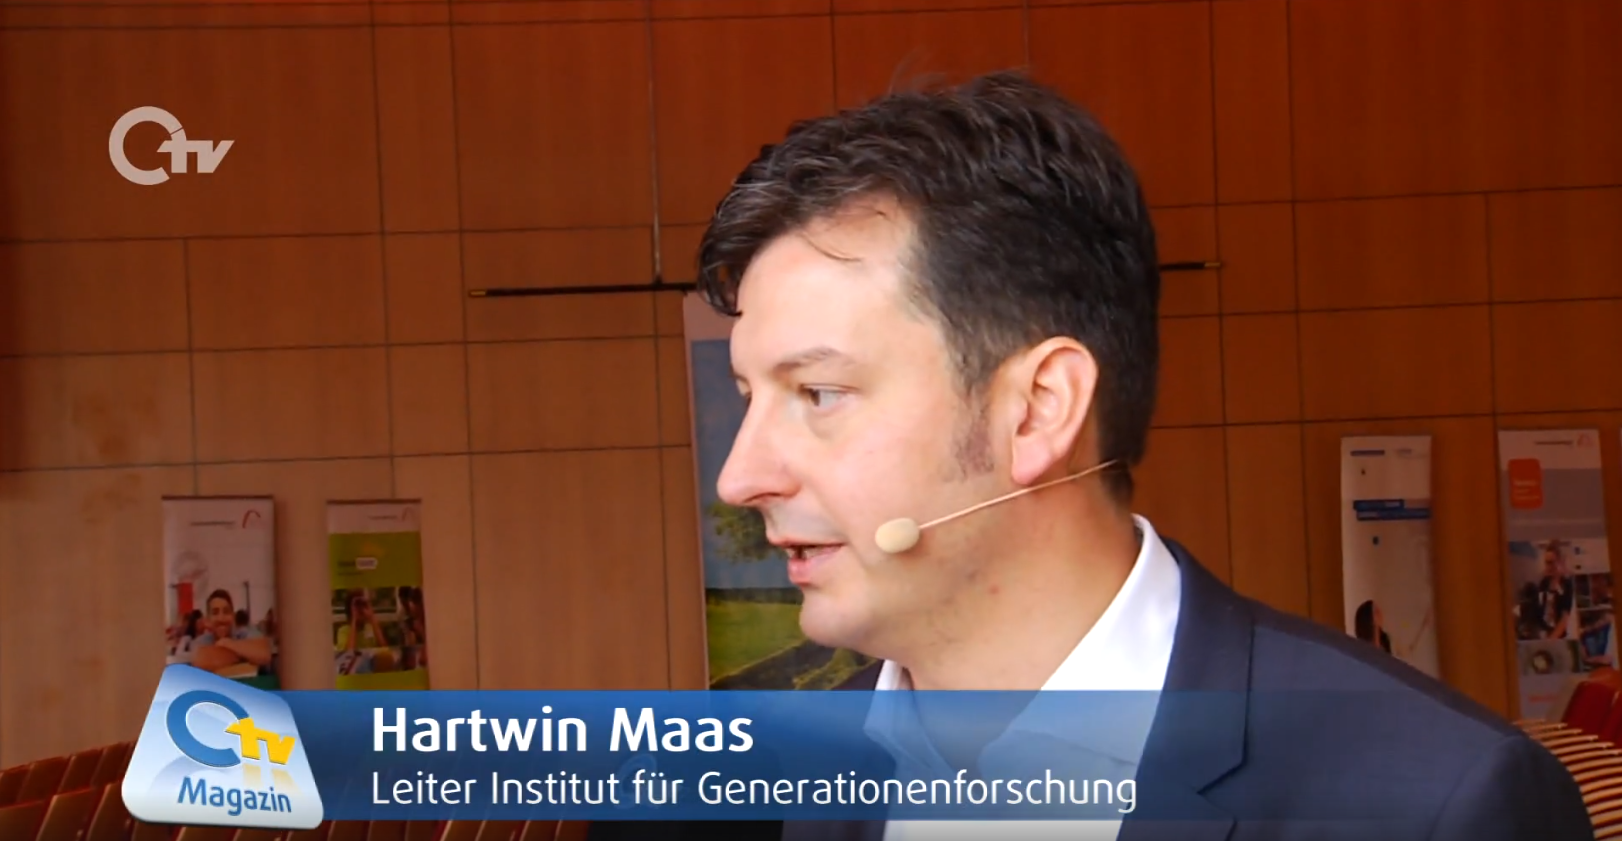 OTV Generation Z Hartwin Maas